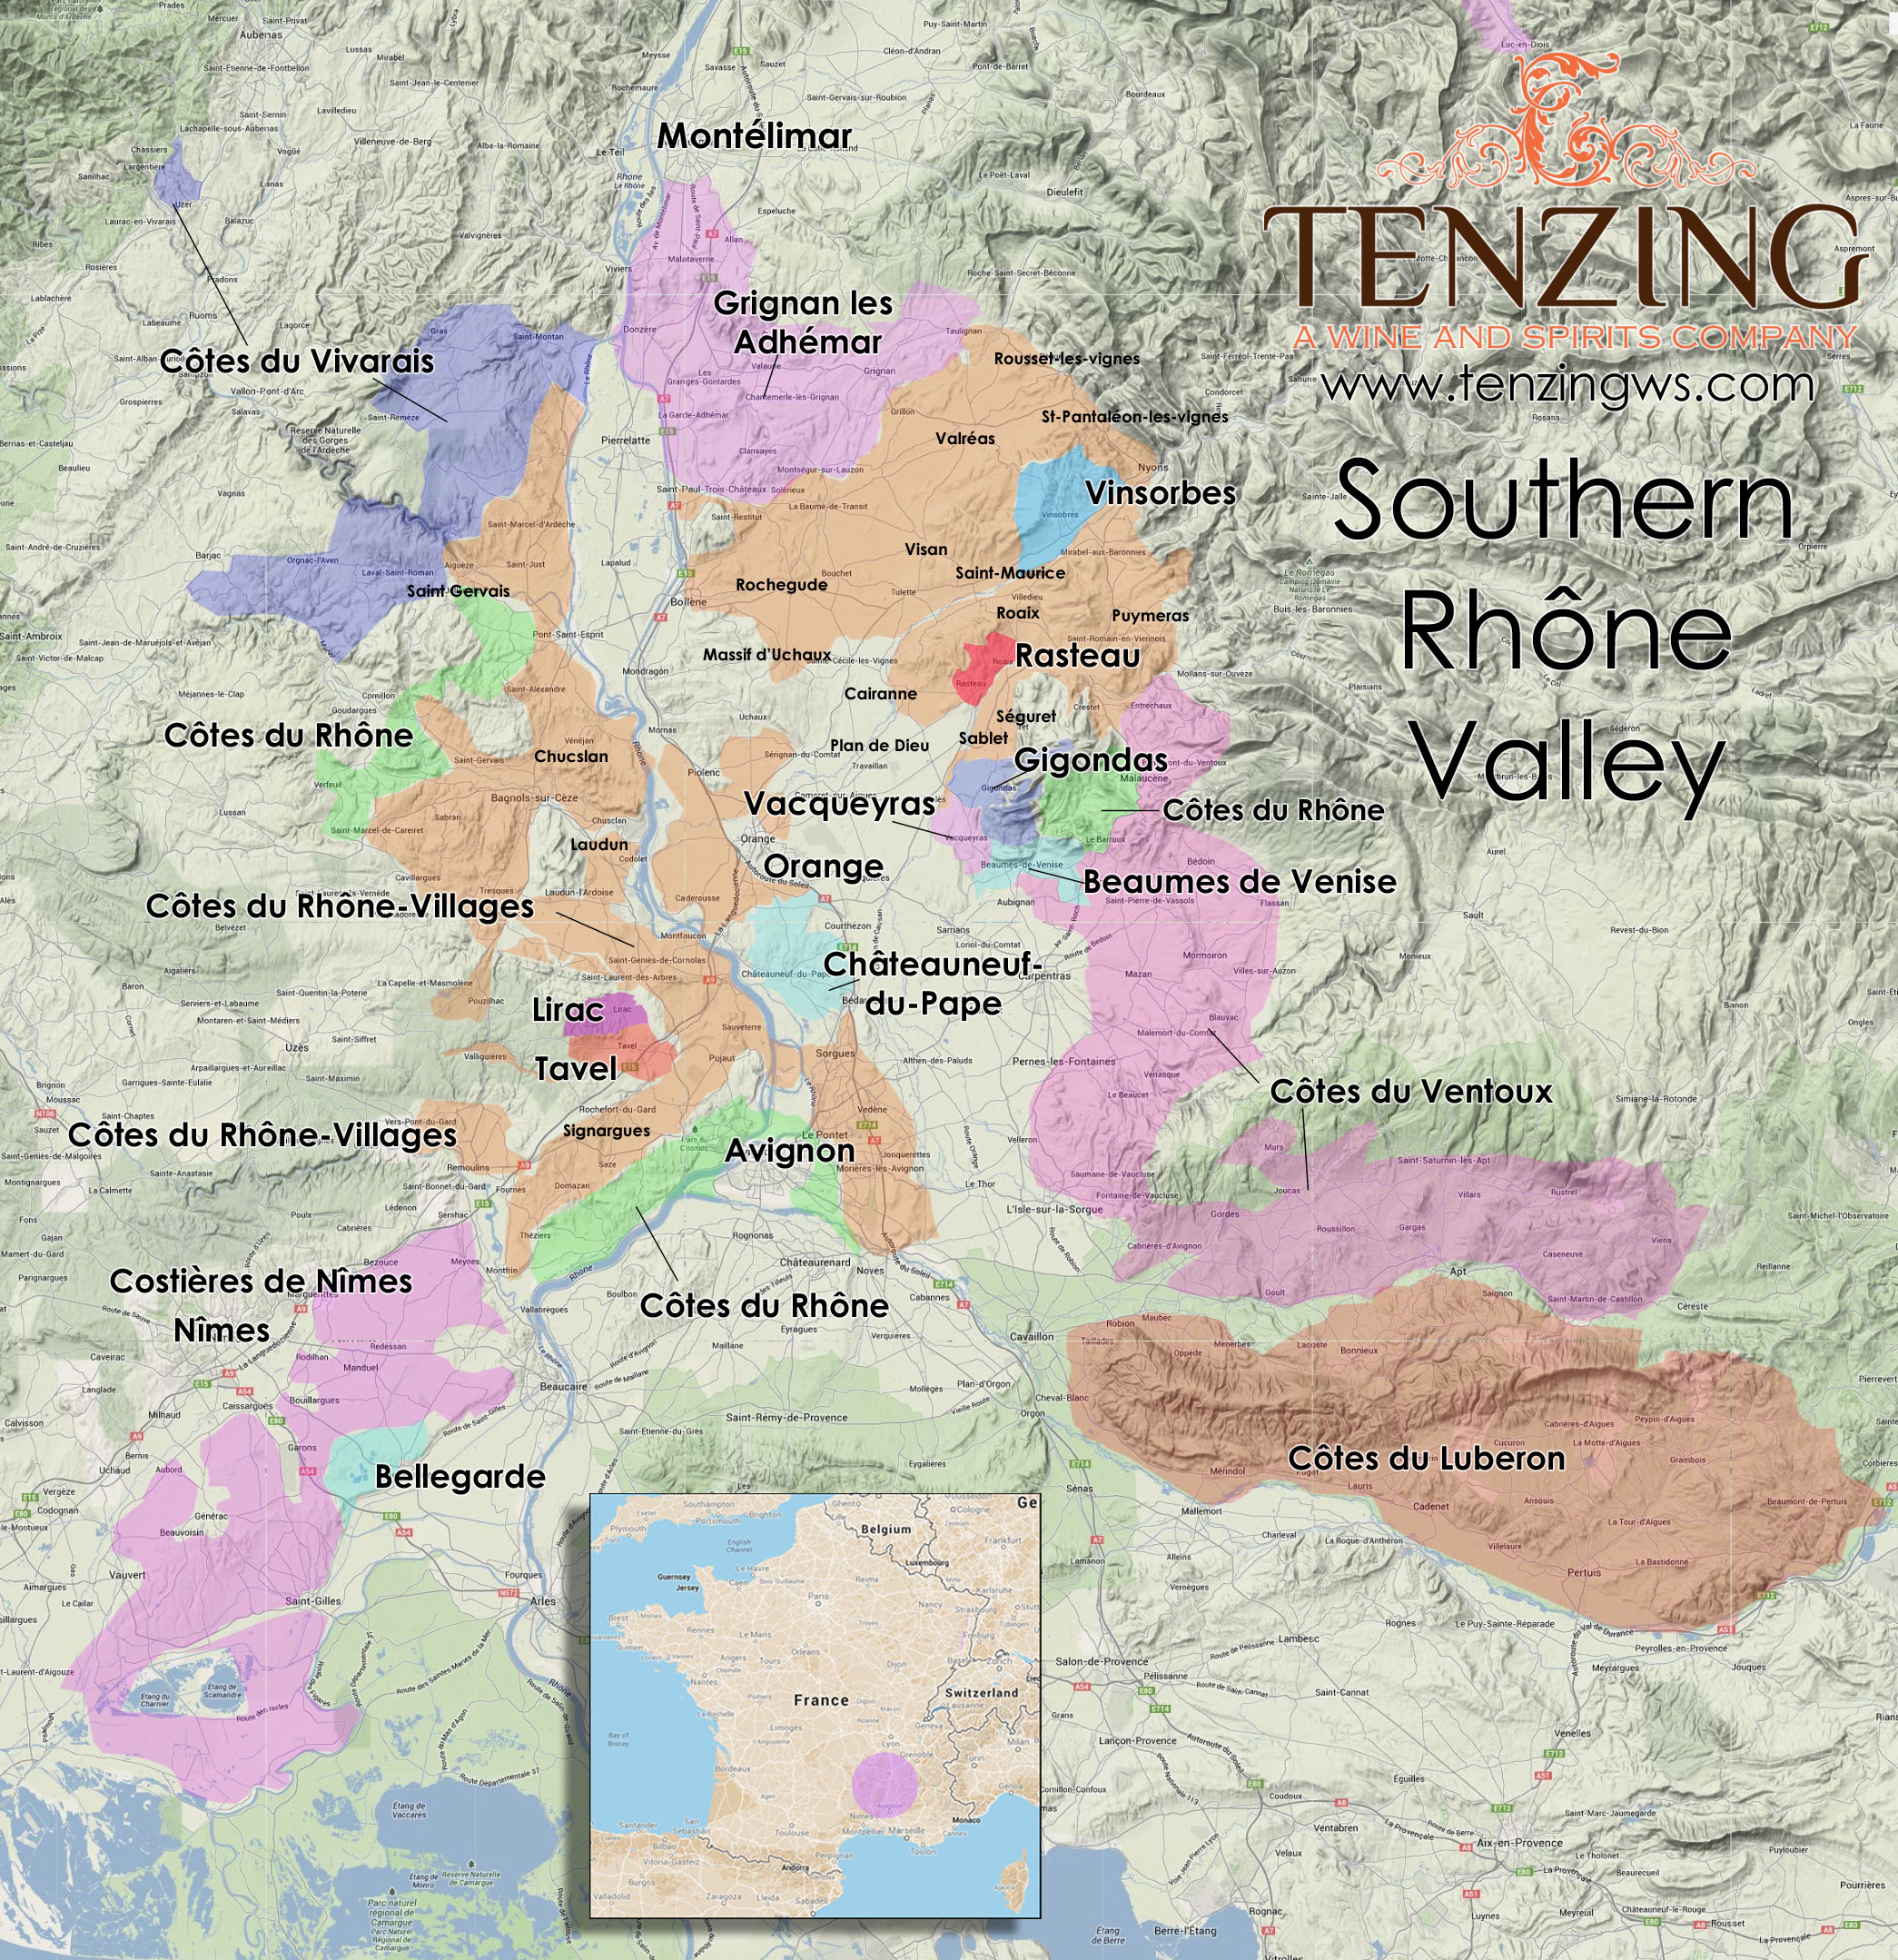 Southern-Rhone-Map_terrain.jpg